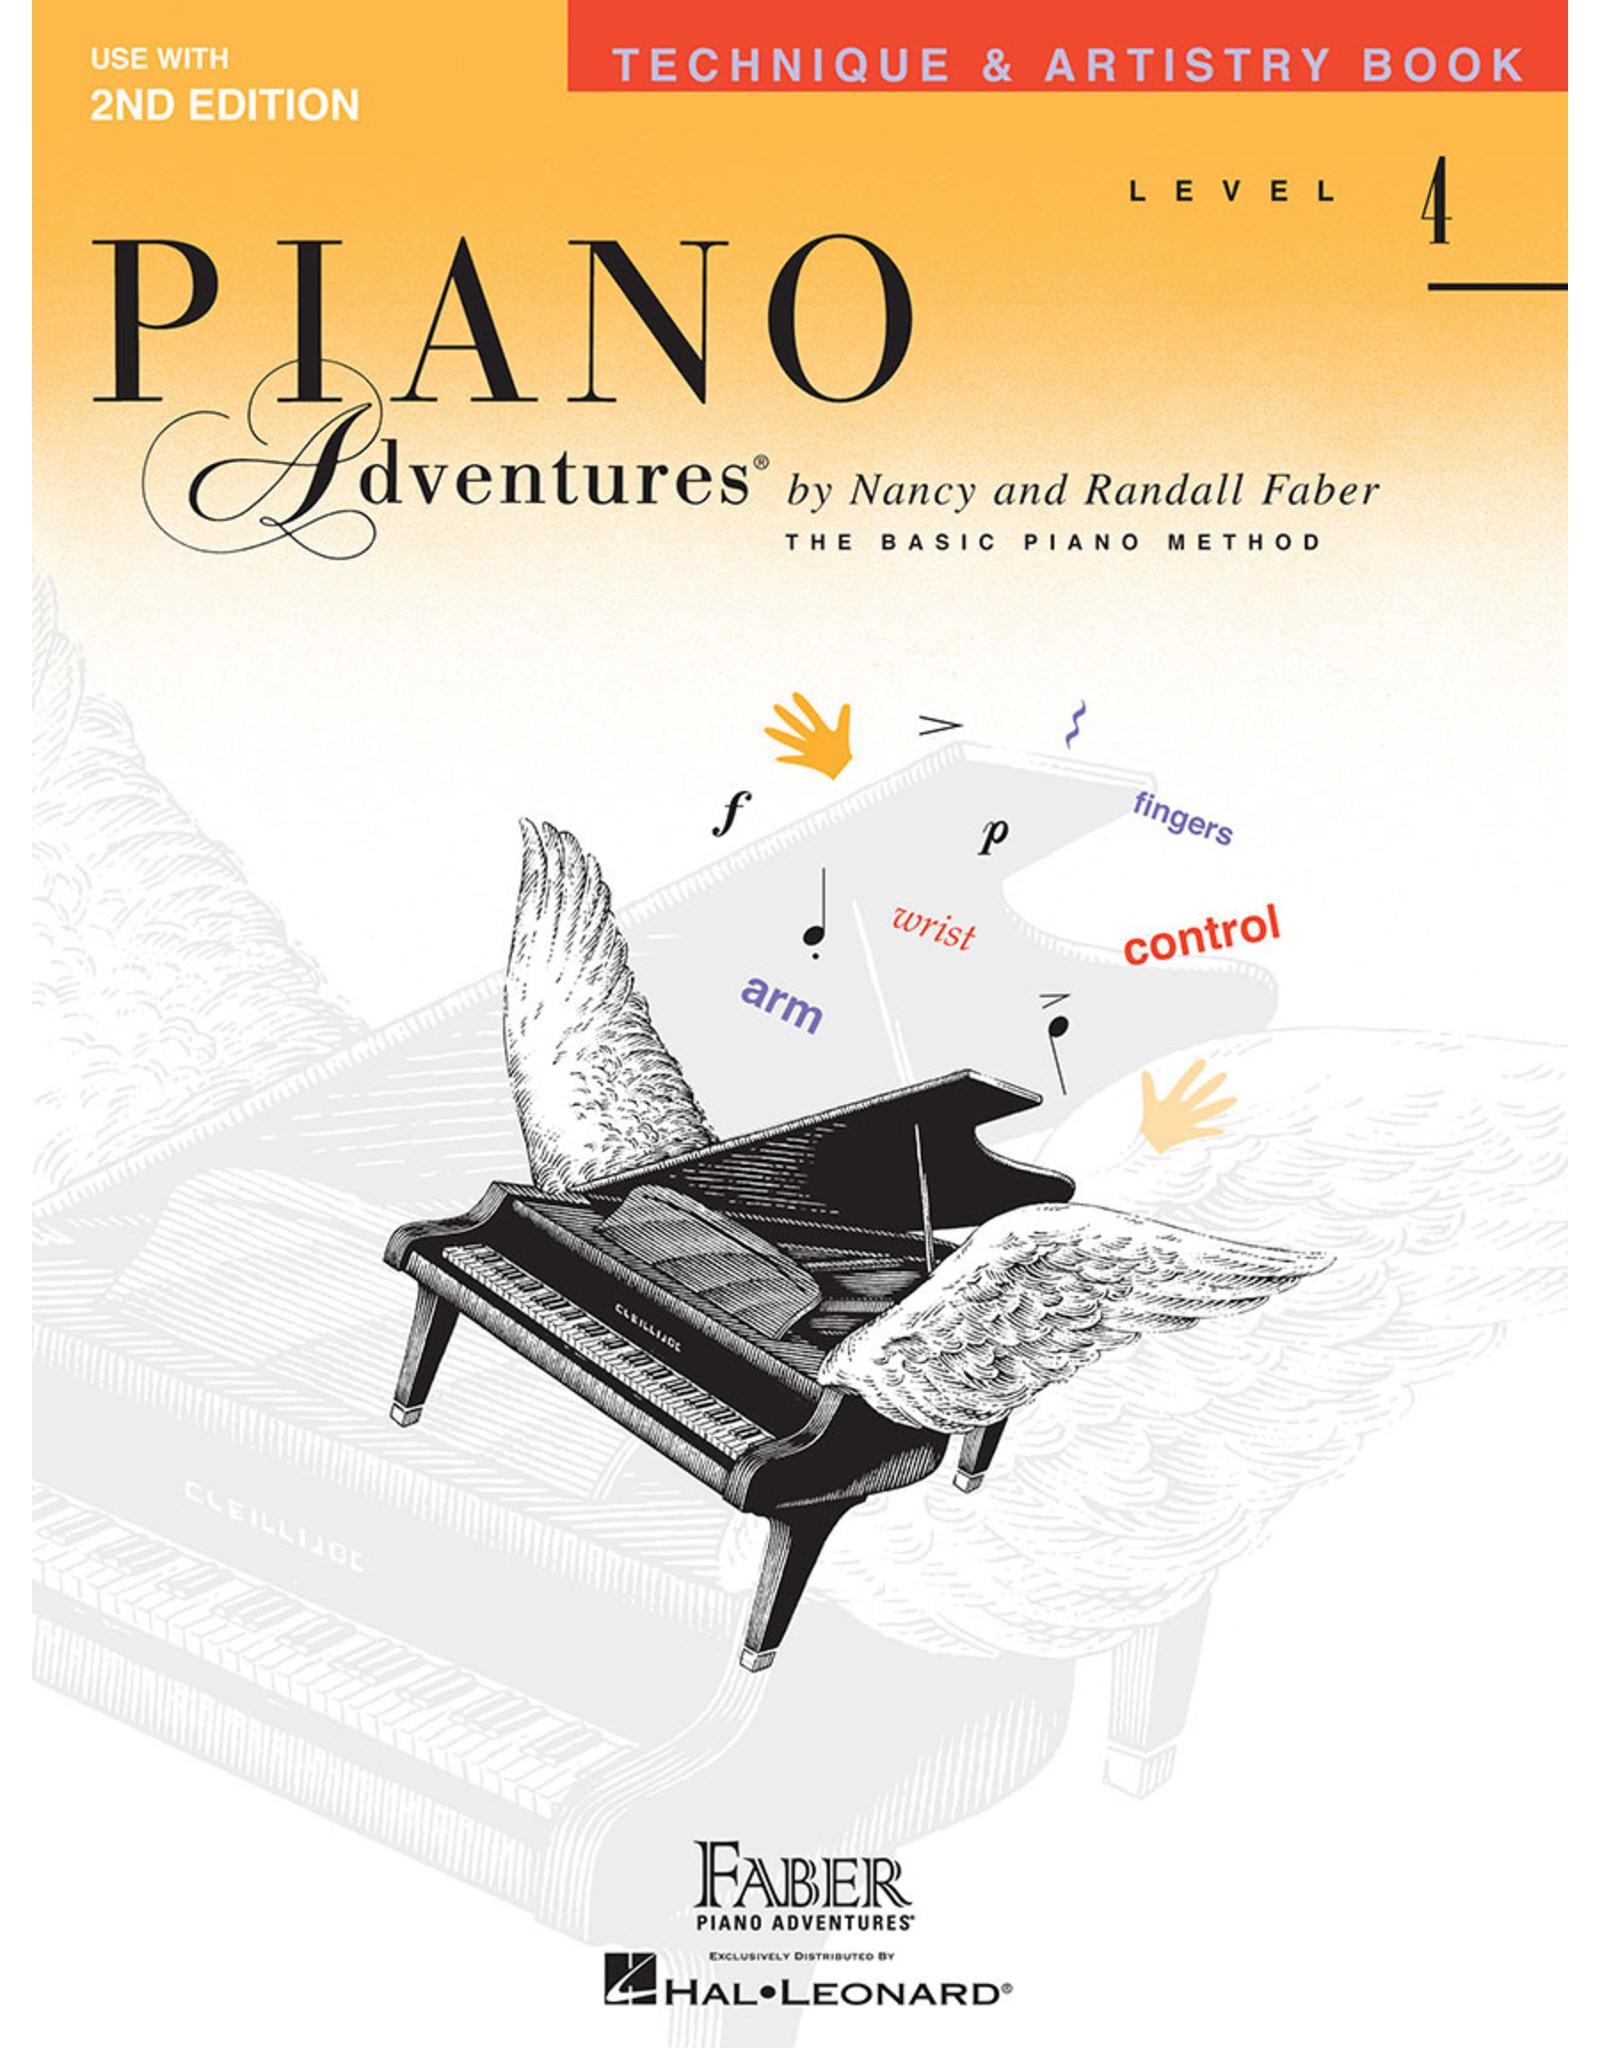 Hal Leonard Faber Piano Adventures Technique & Artistry Book